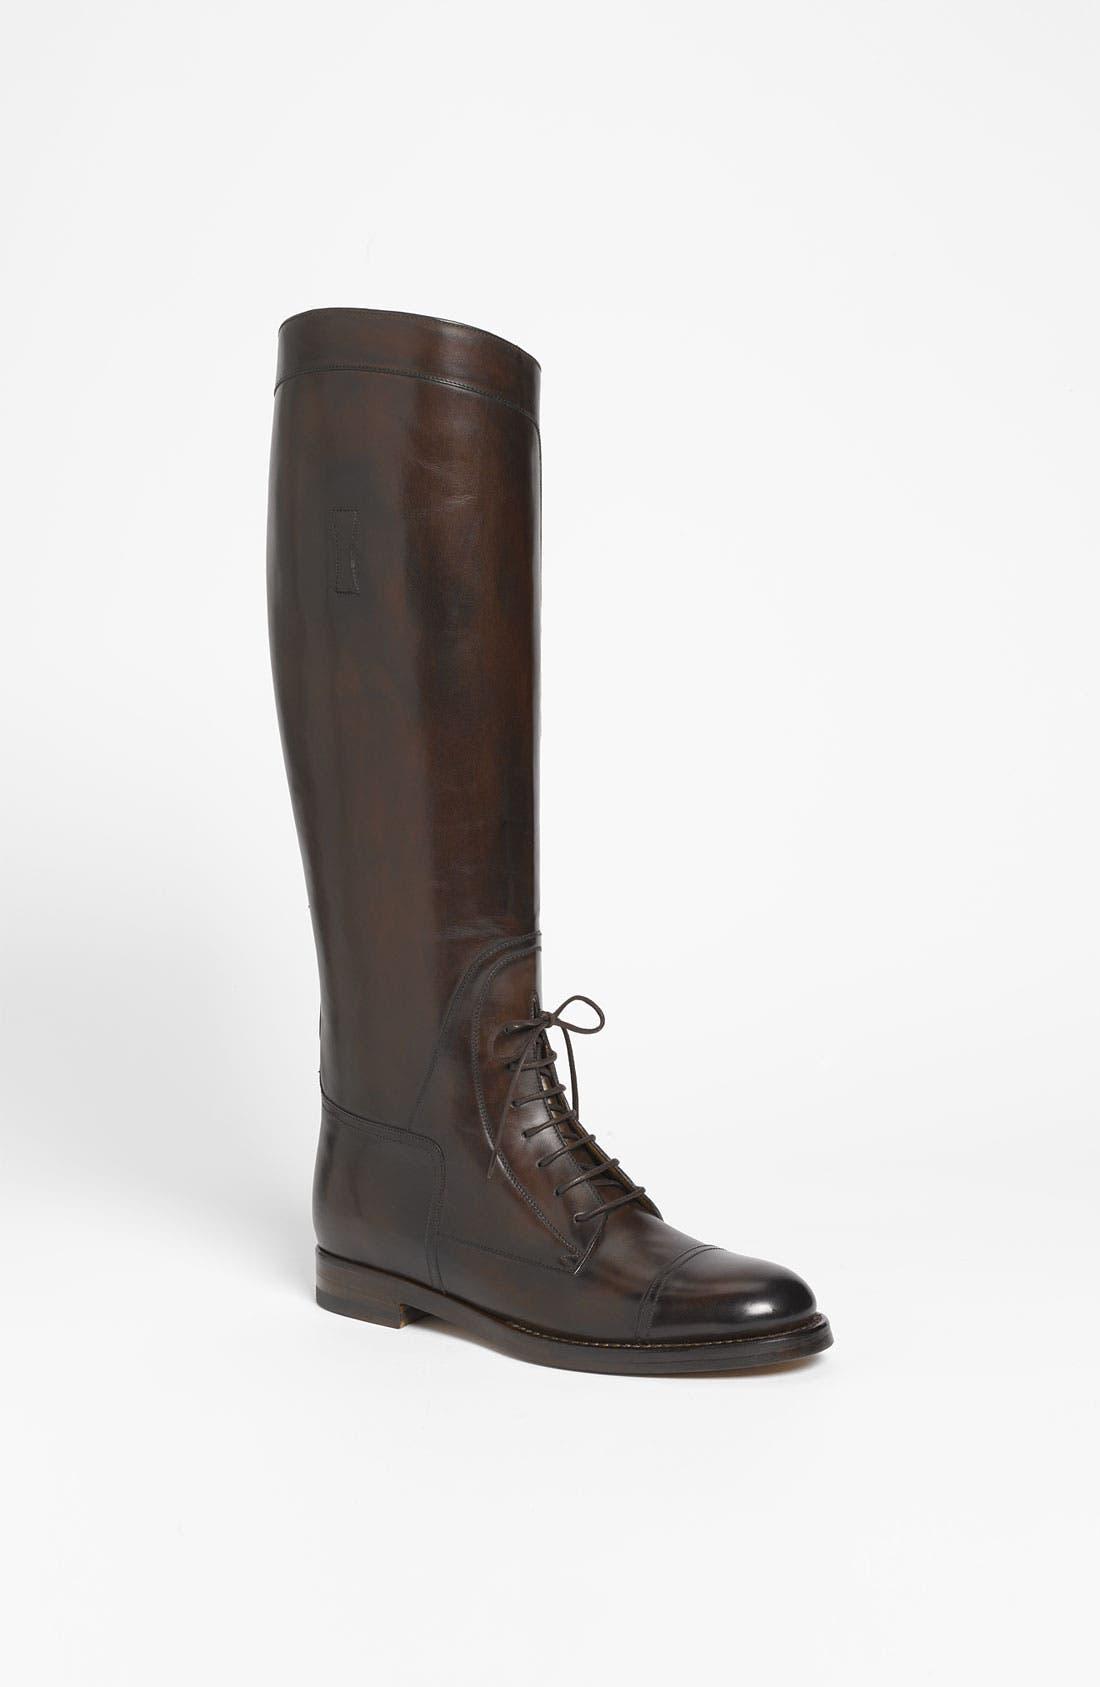 Main Image - Gucci 'Boulanger' Boot